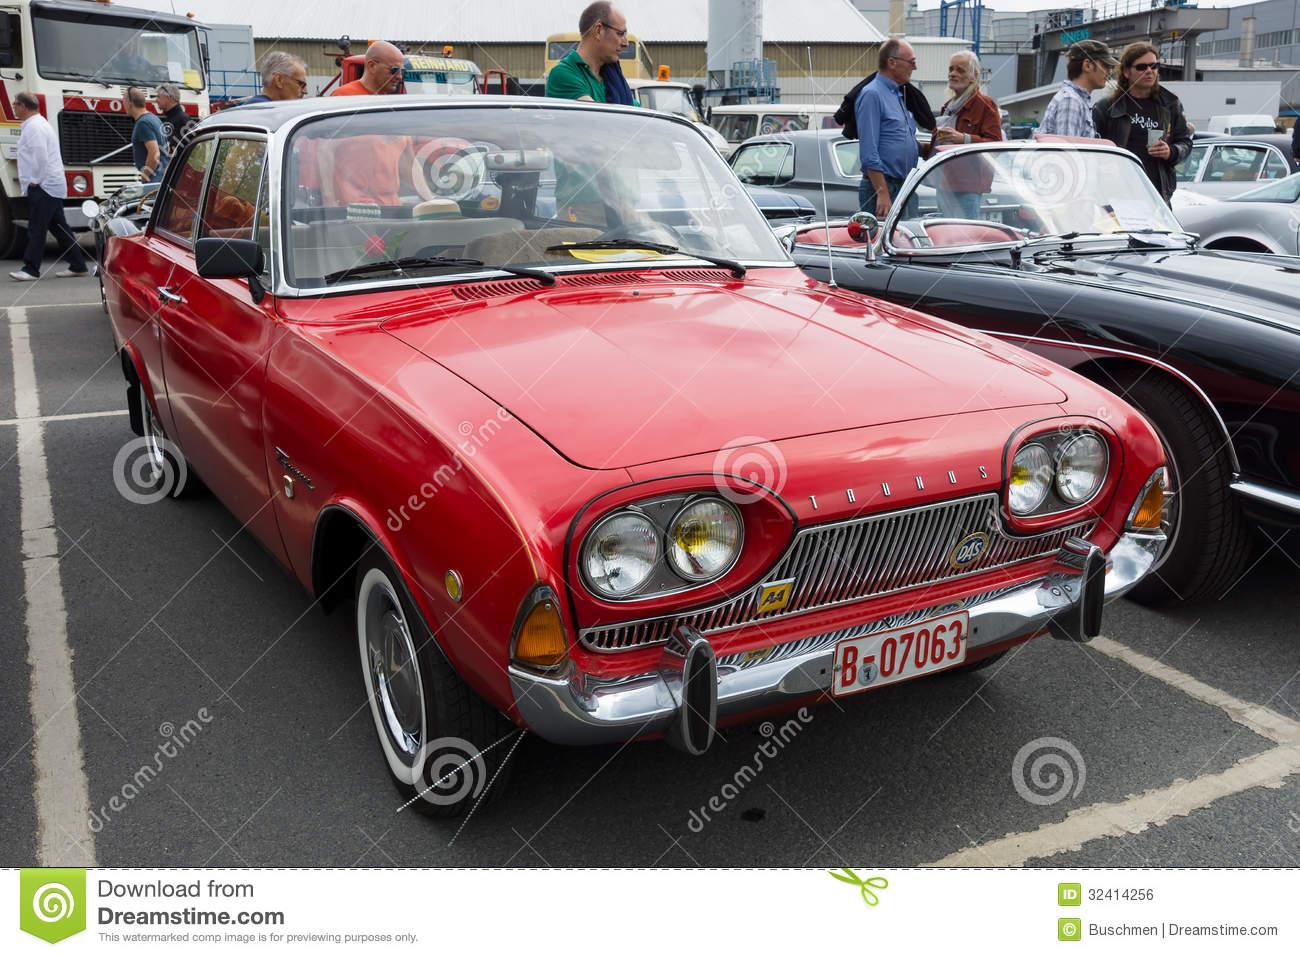 carro-ford-taunus-m-p-32414256.jpg